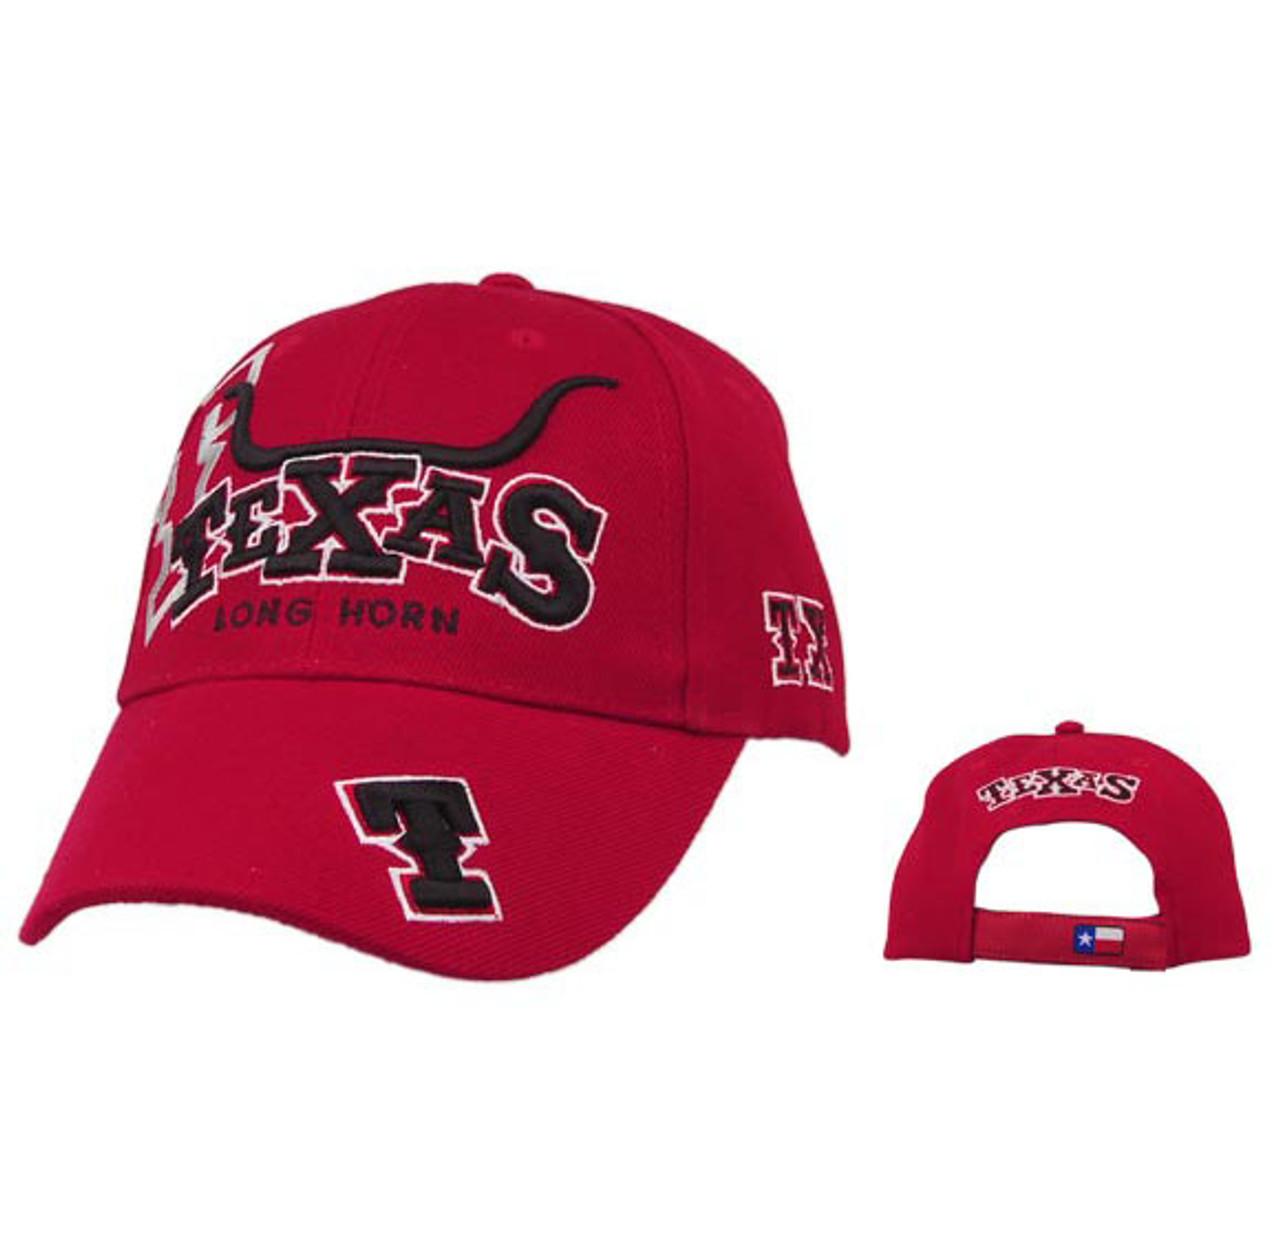 Red Texas Long Horns Baseball Caps